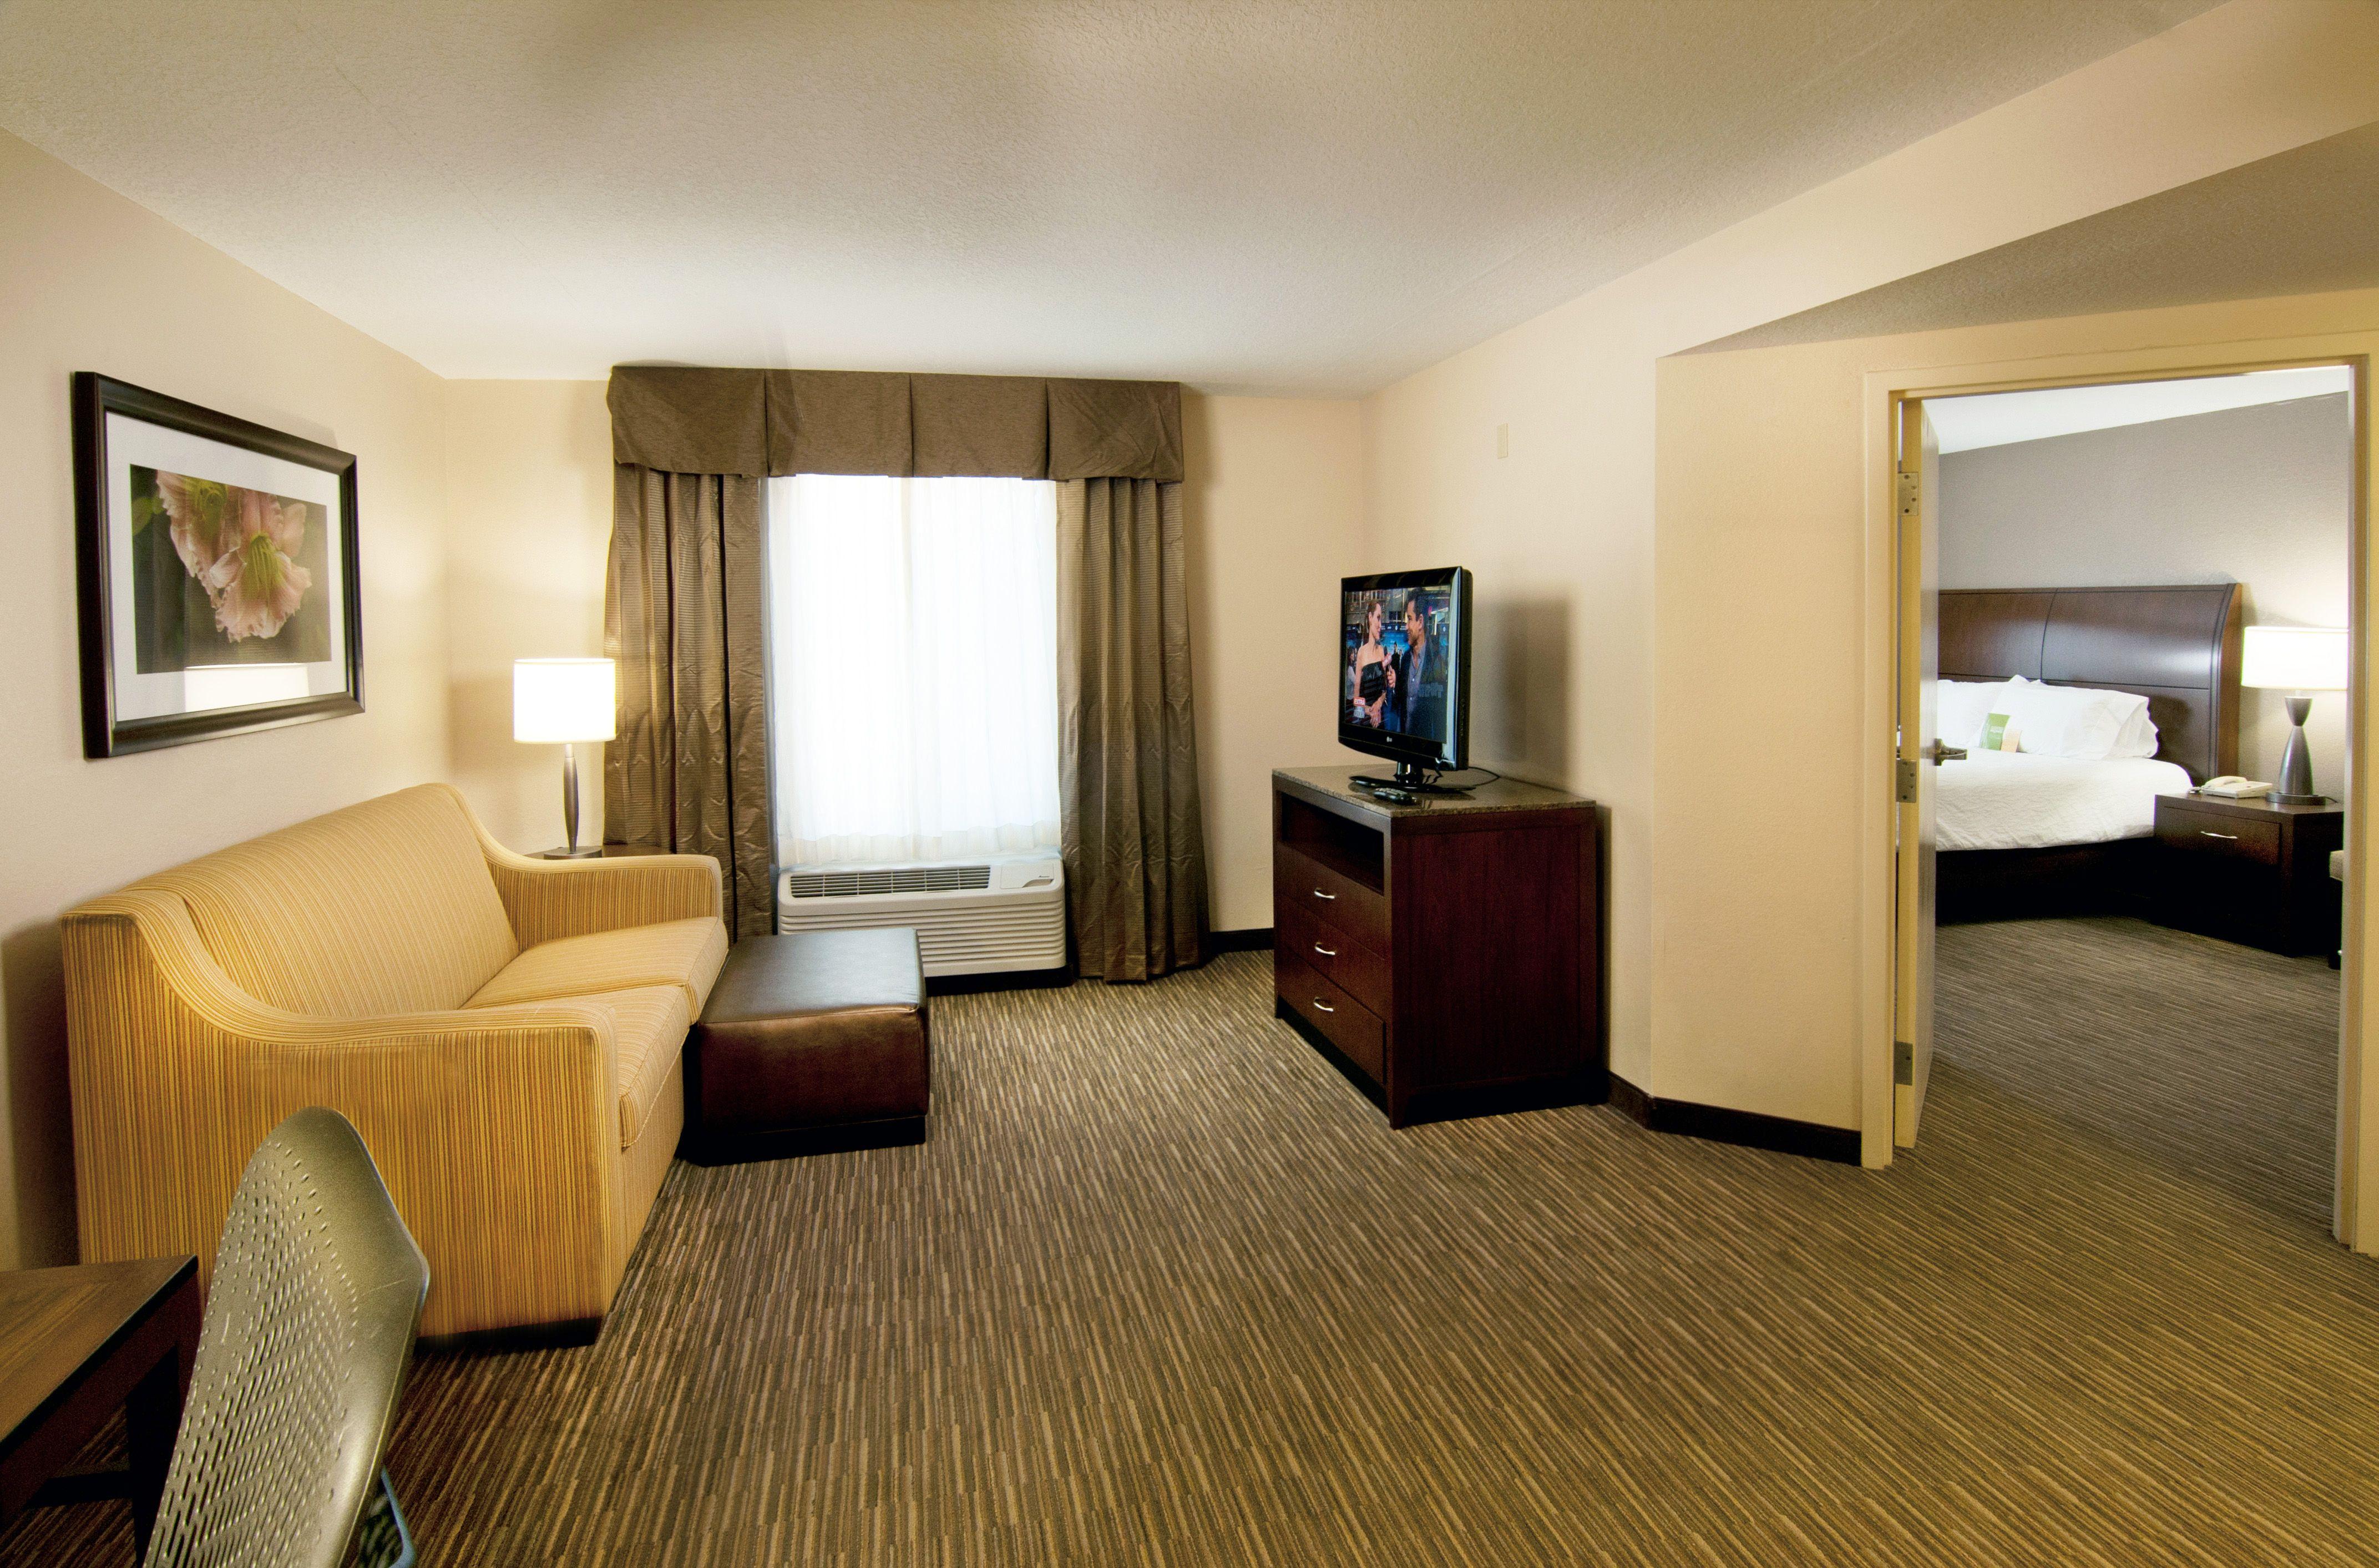 King Suite at the Hilton Garden Inn Sarasota Bradenton Airport in ...